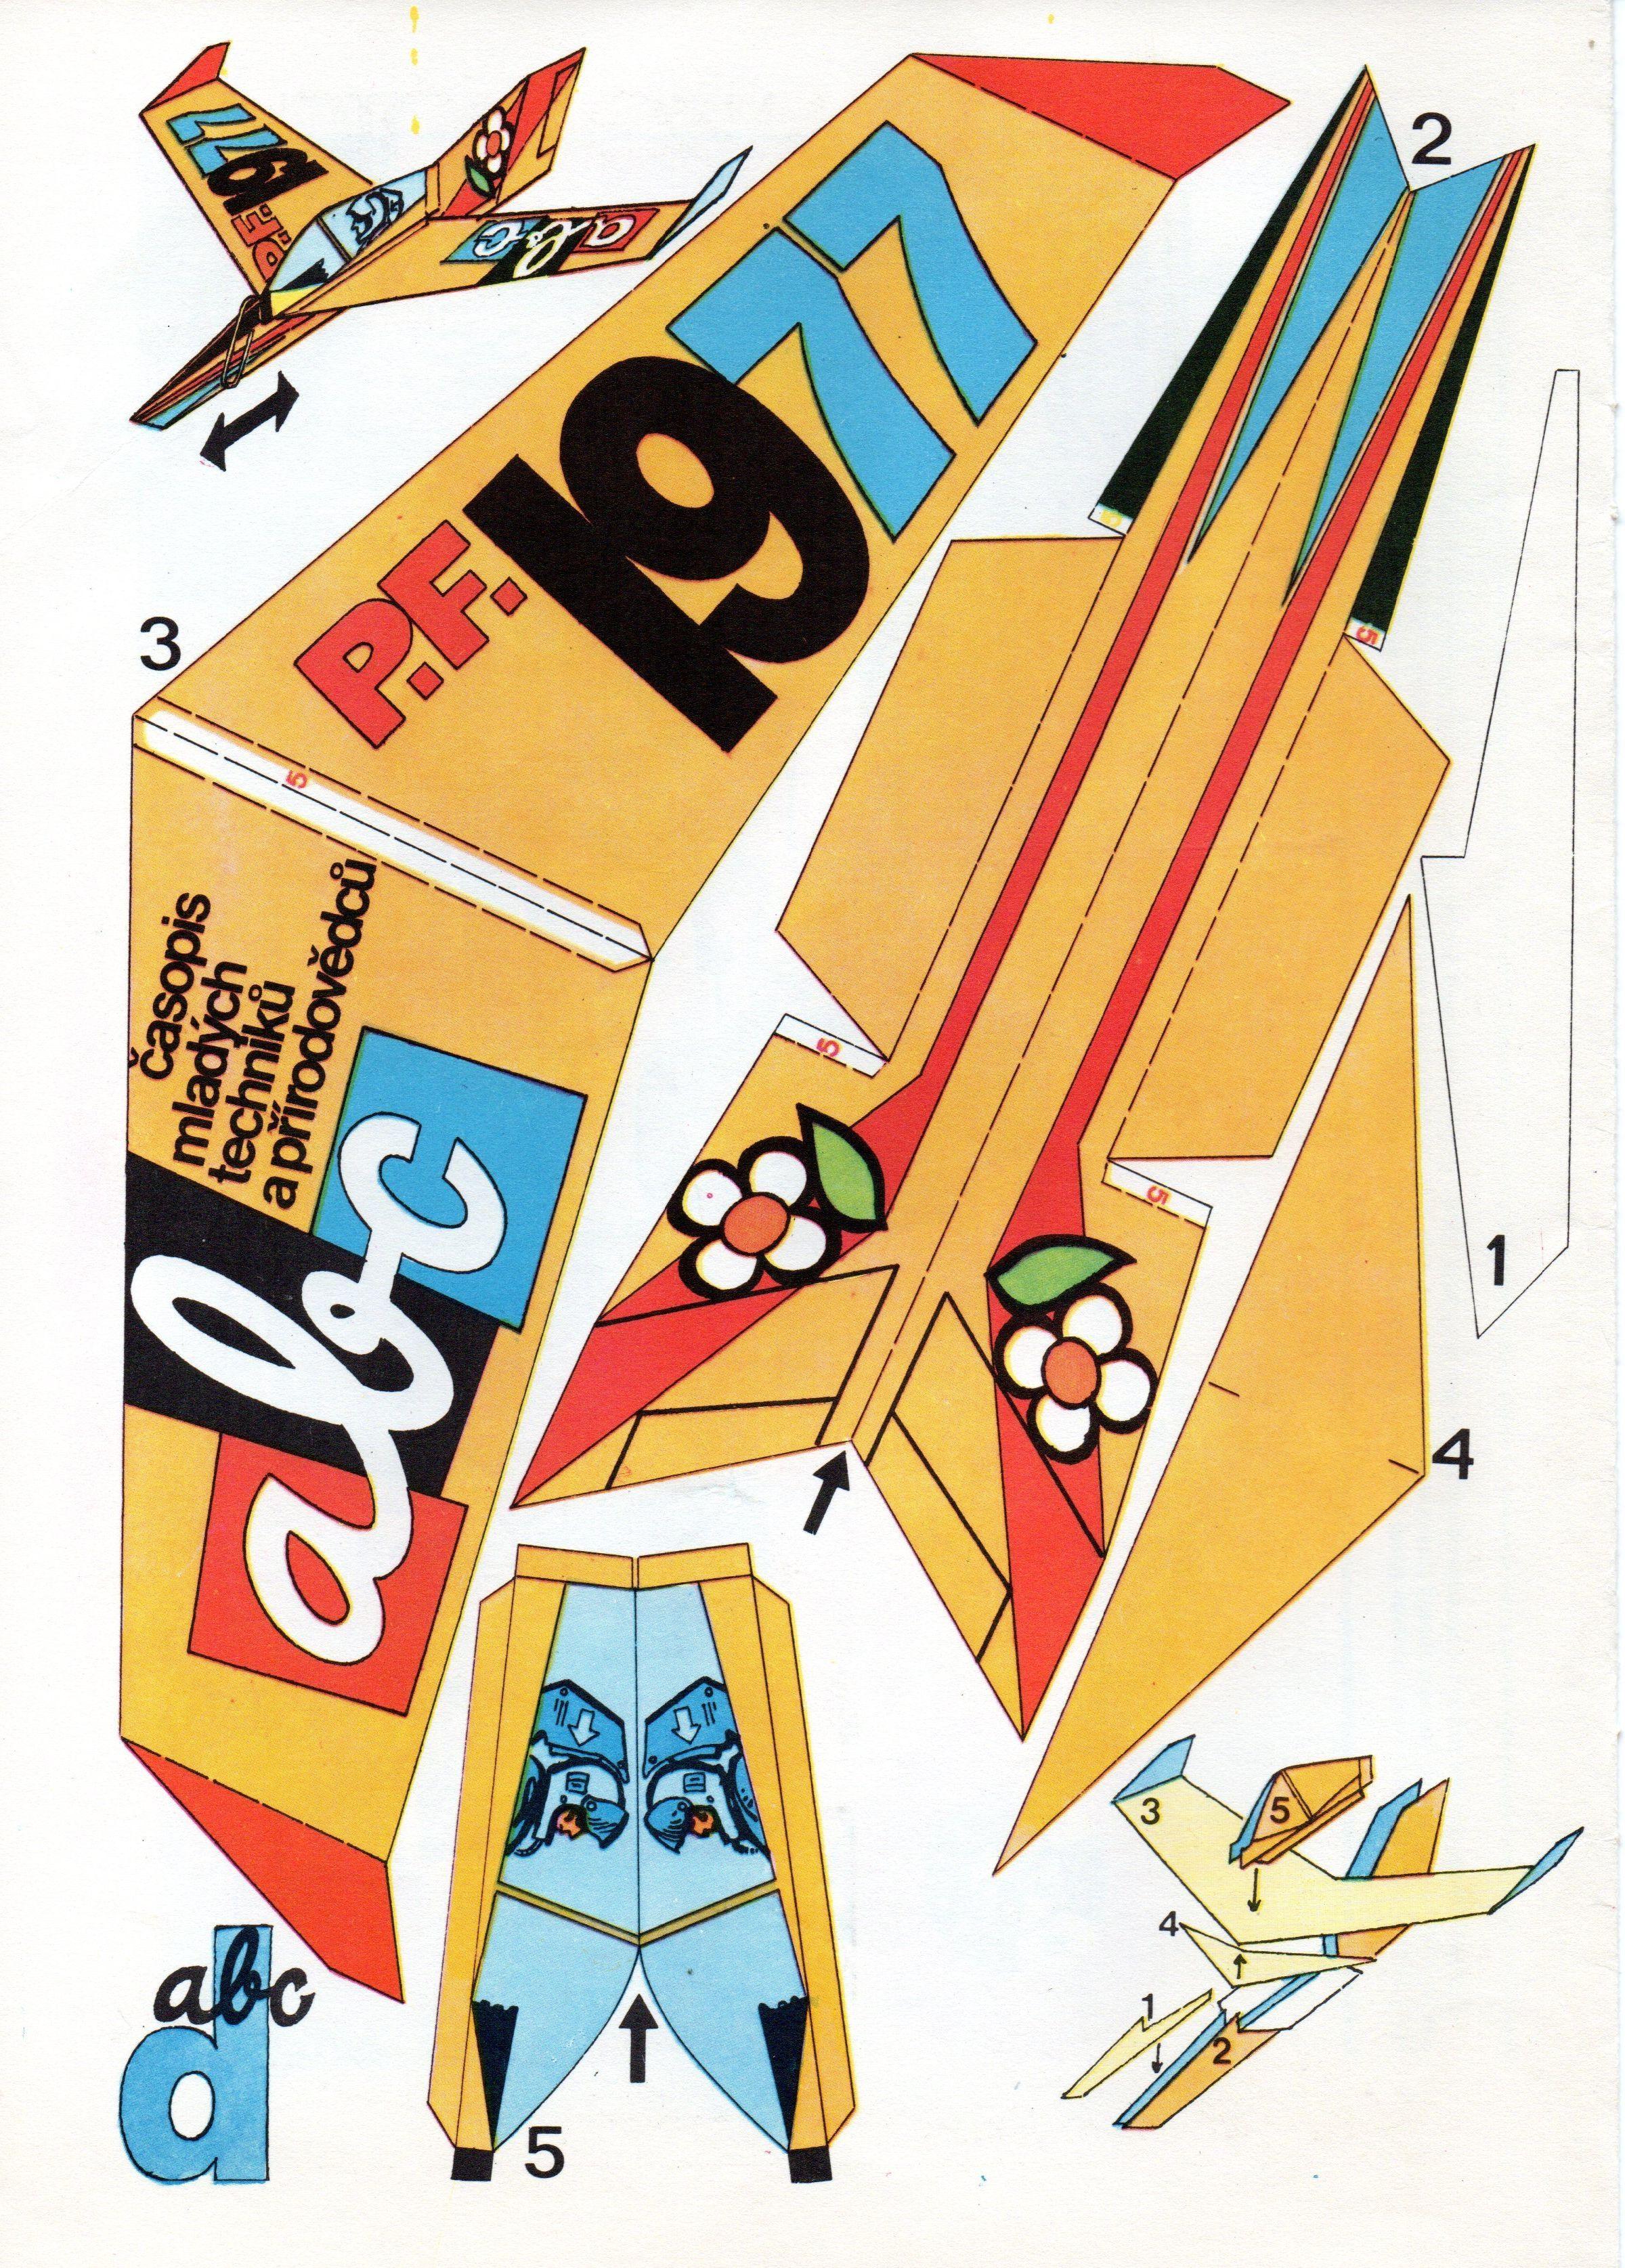 Paper Plane (ABC Magazine) Paper airplane models, Paper